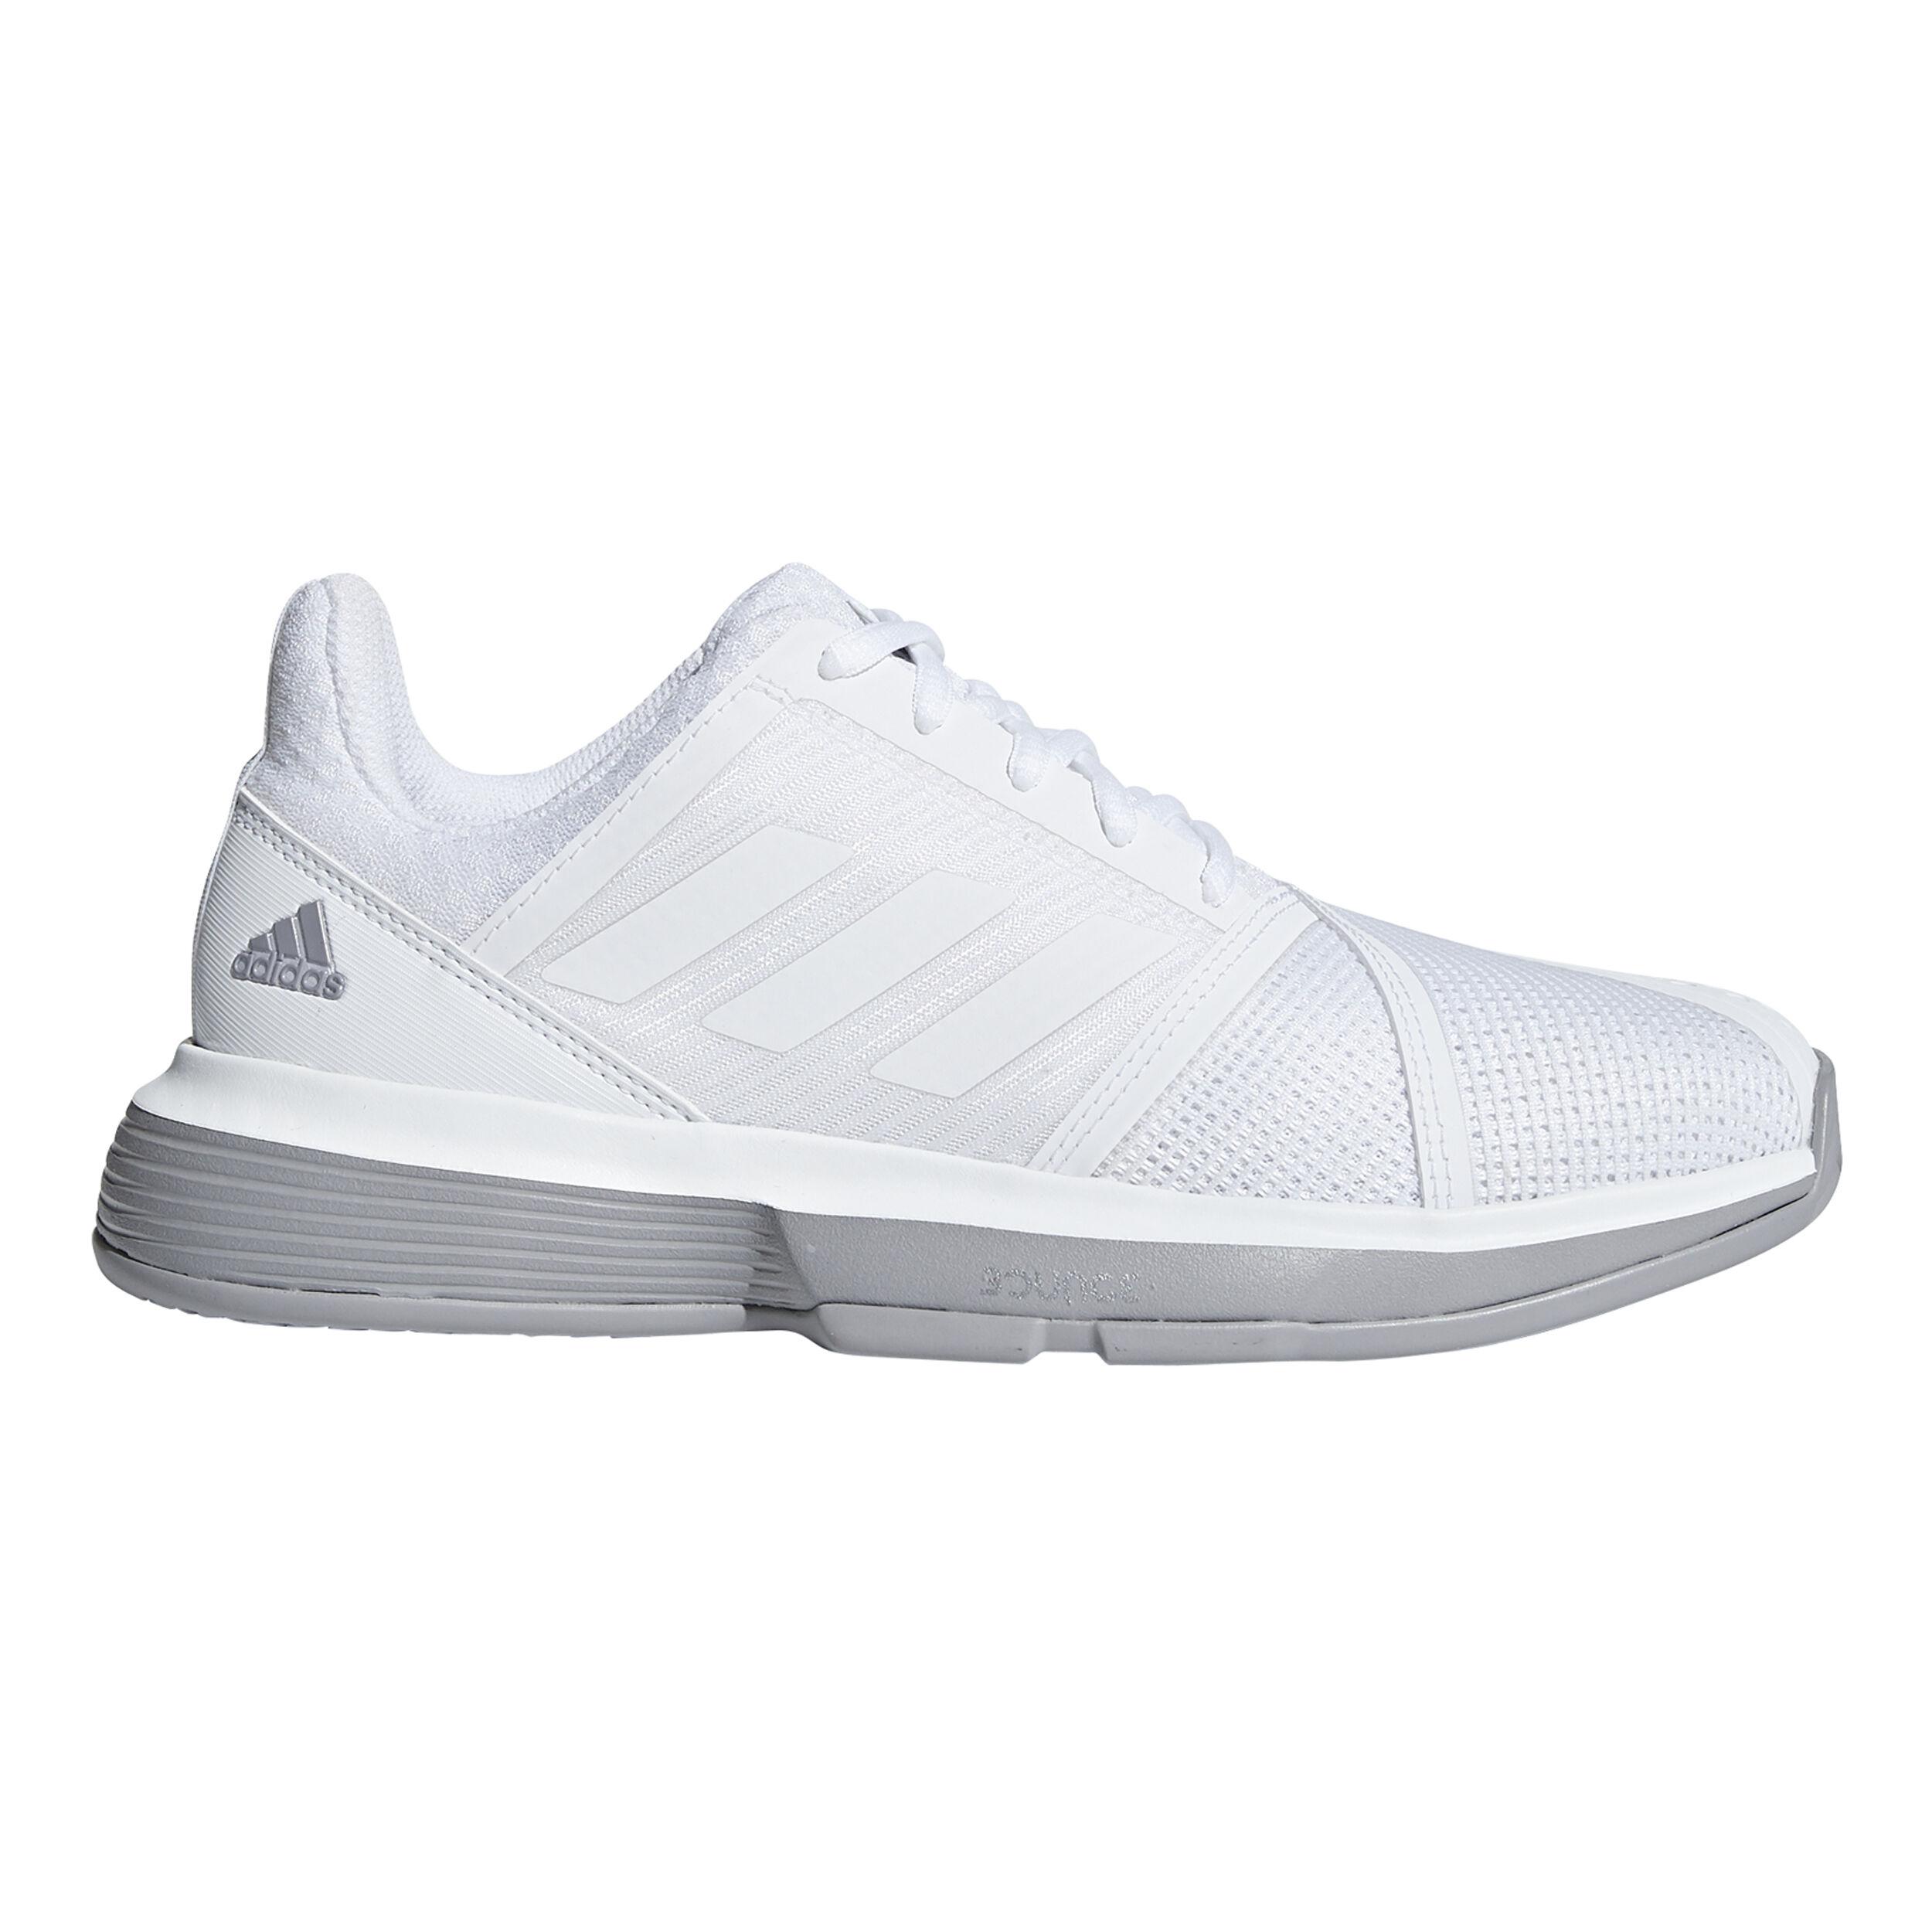 adidas Court Jam Bounce Allcourtschuh Damen - Weiß, Grau ...